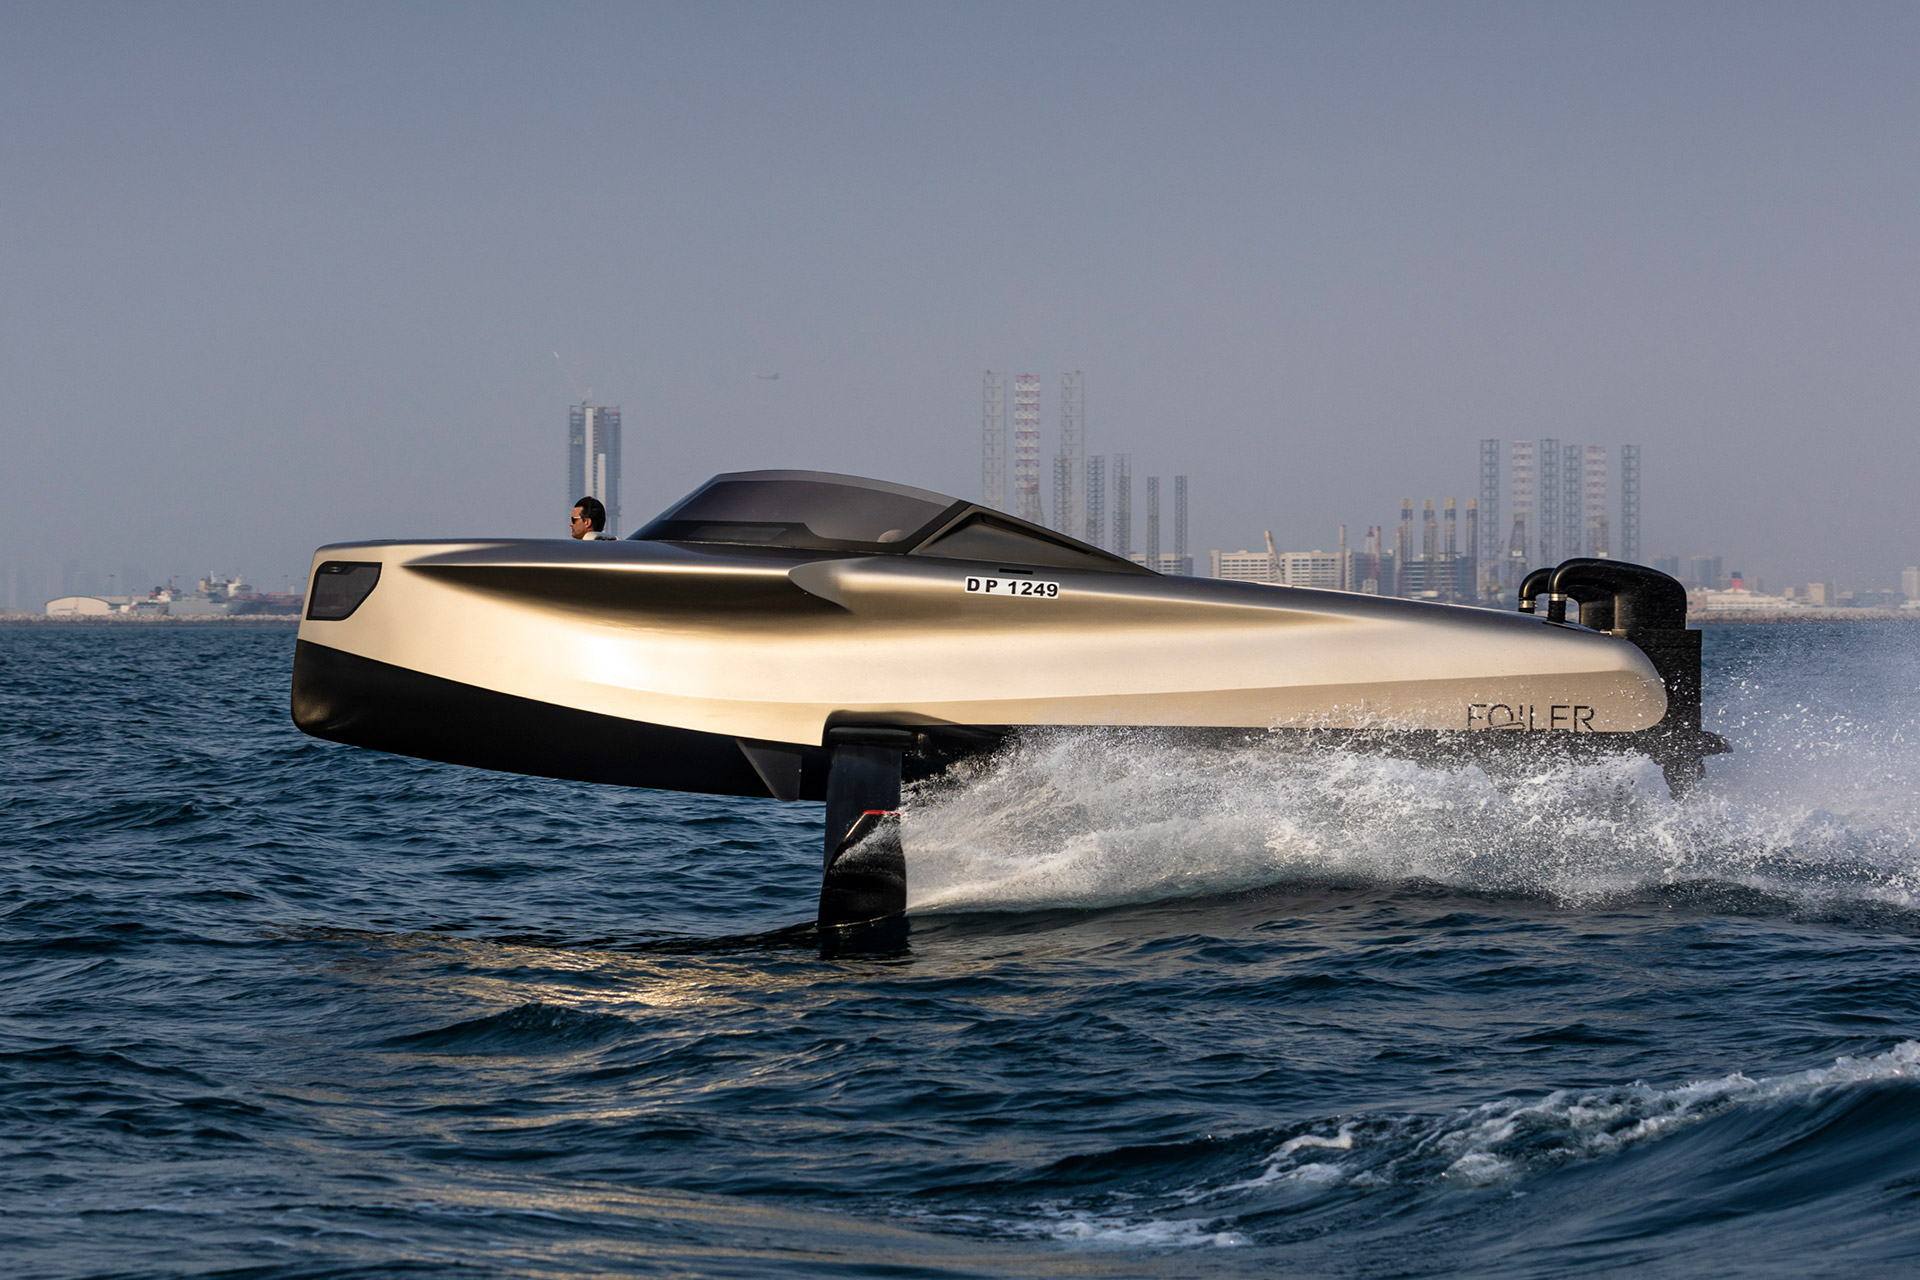 Enata Foiler Flying Yacht